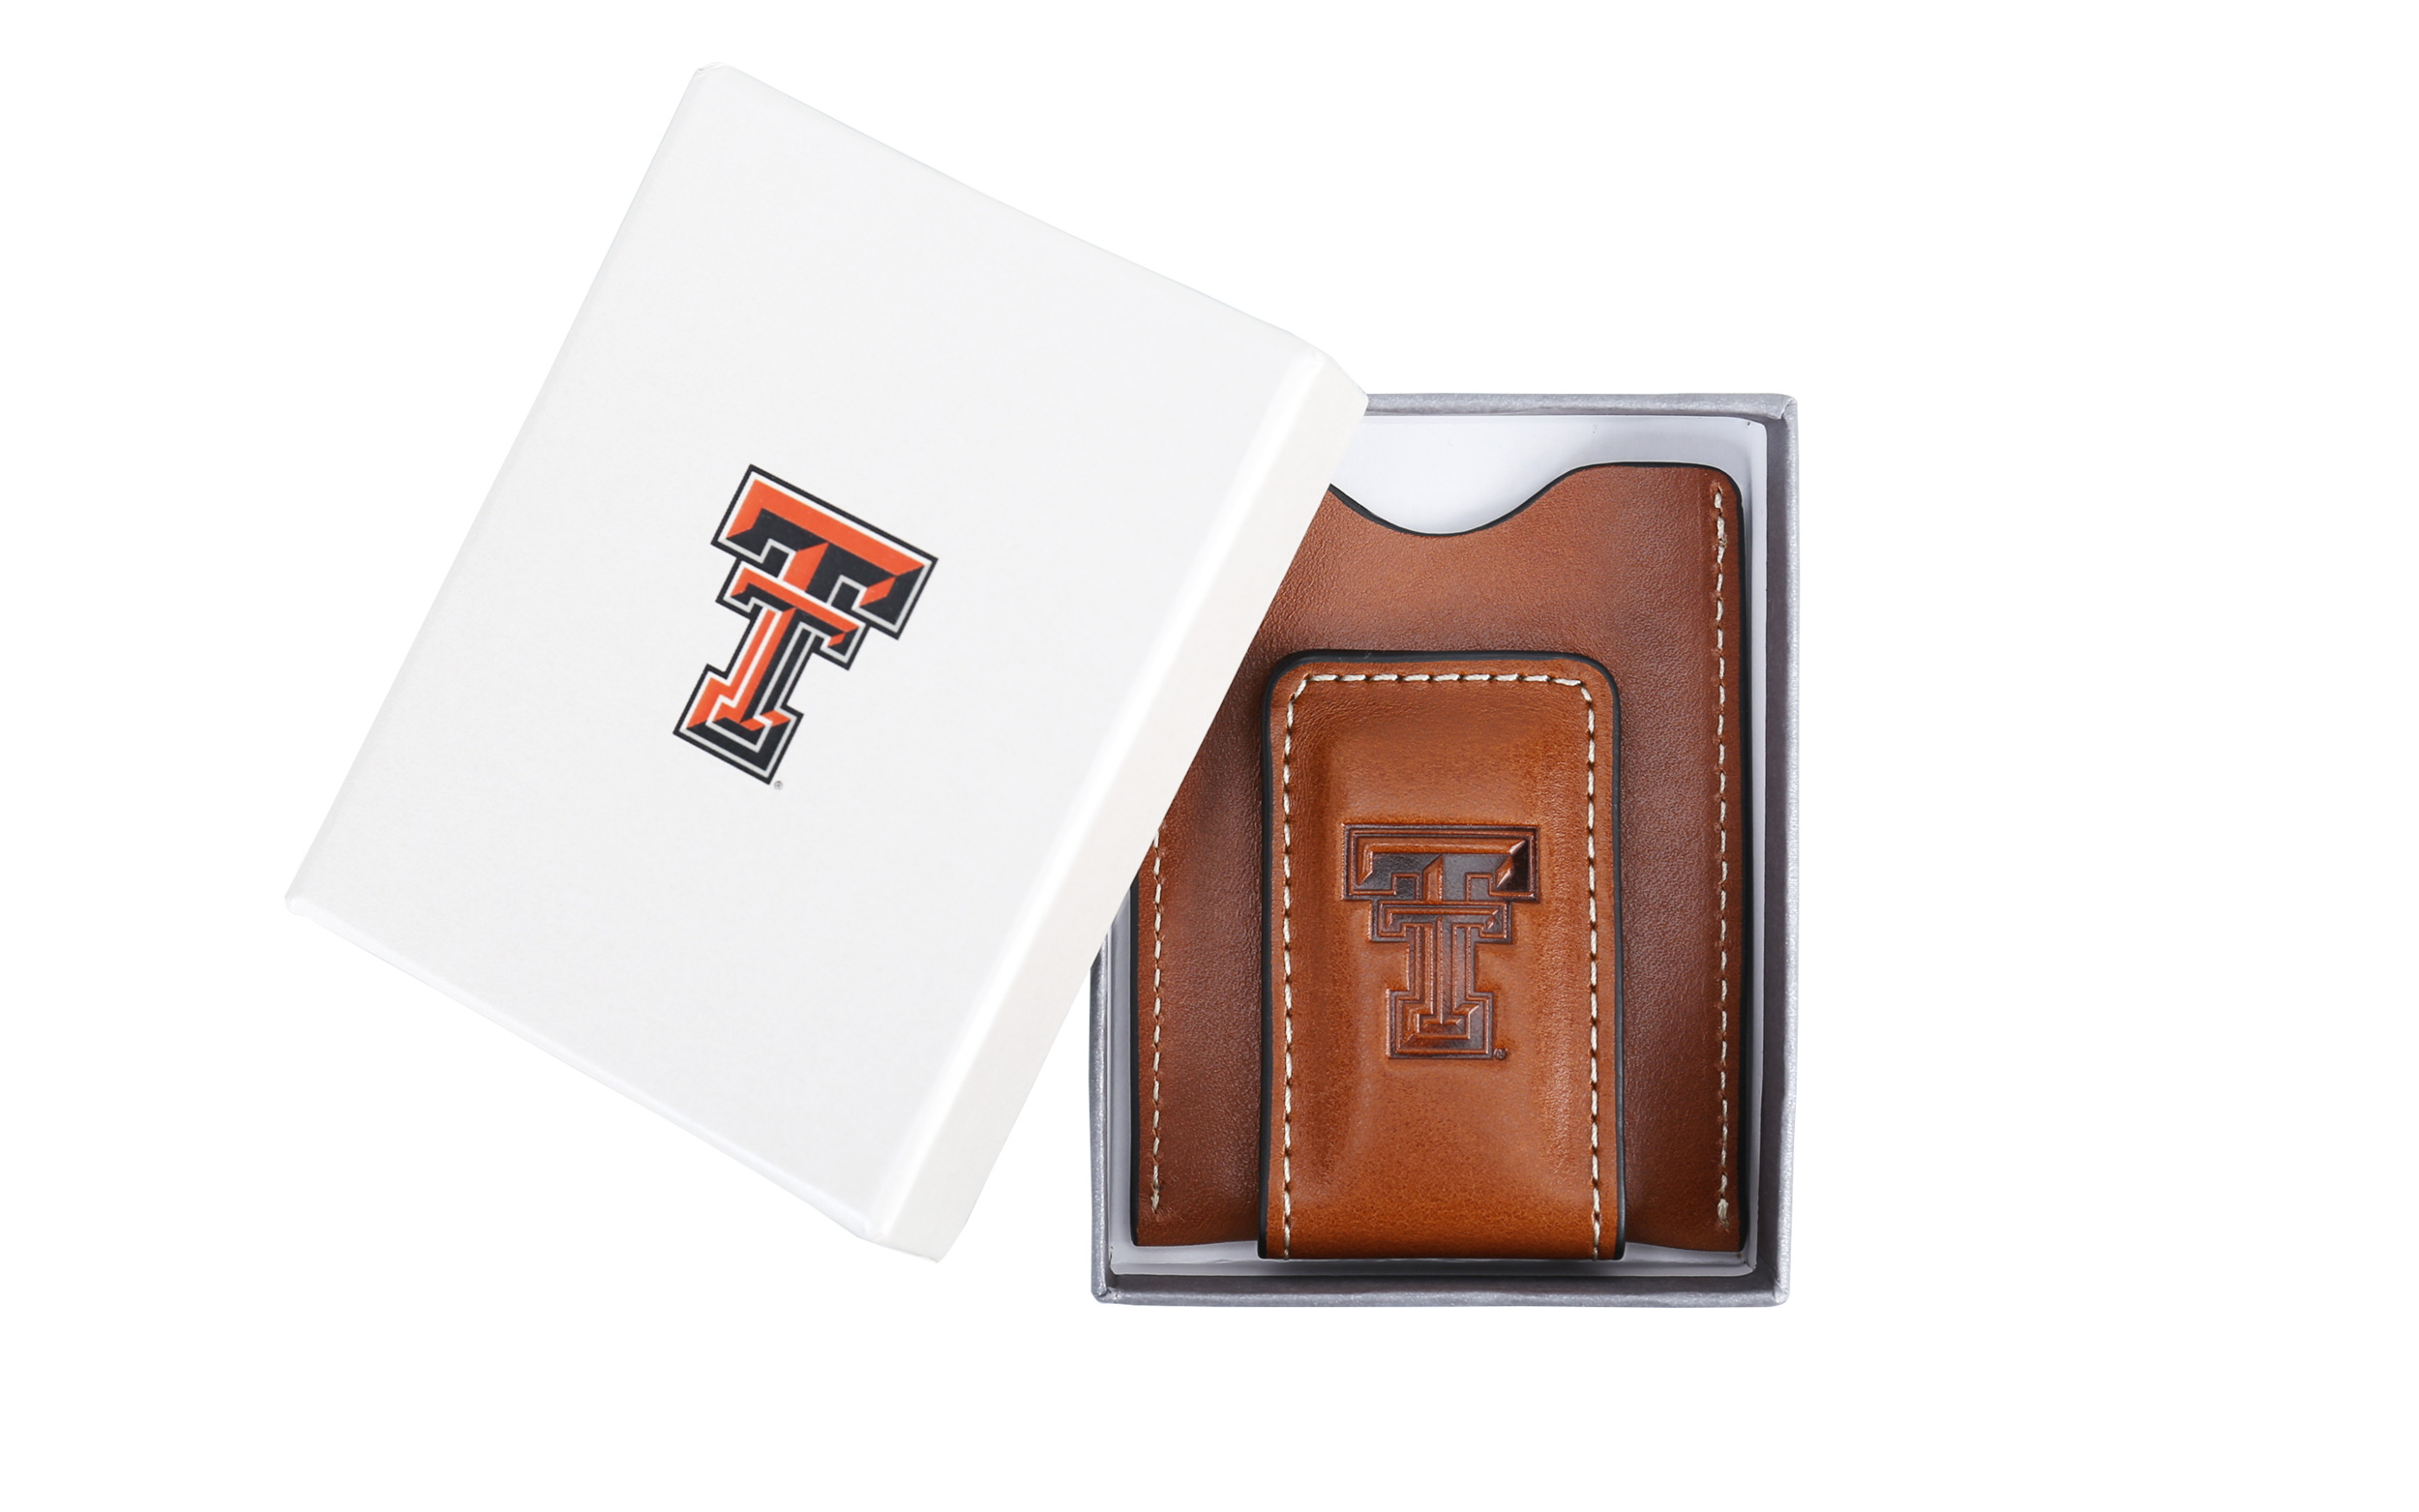 tx tech money clip in box.png